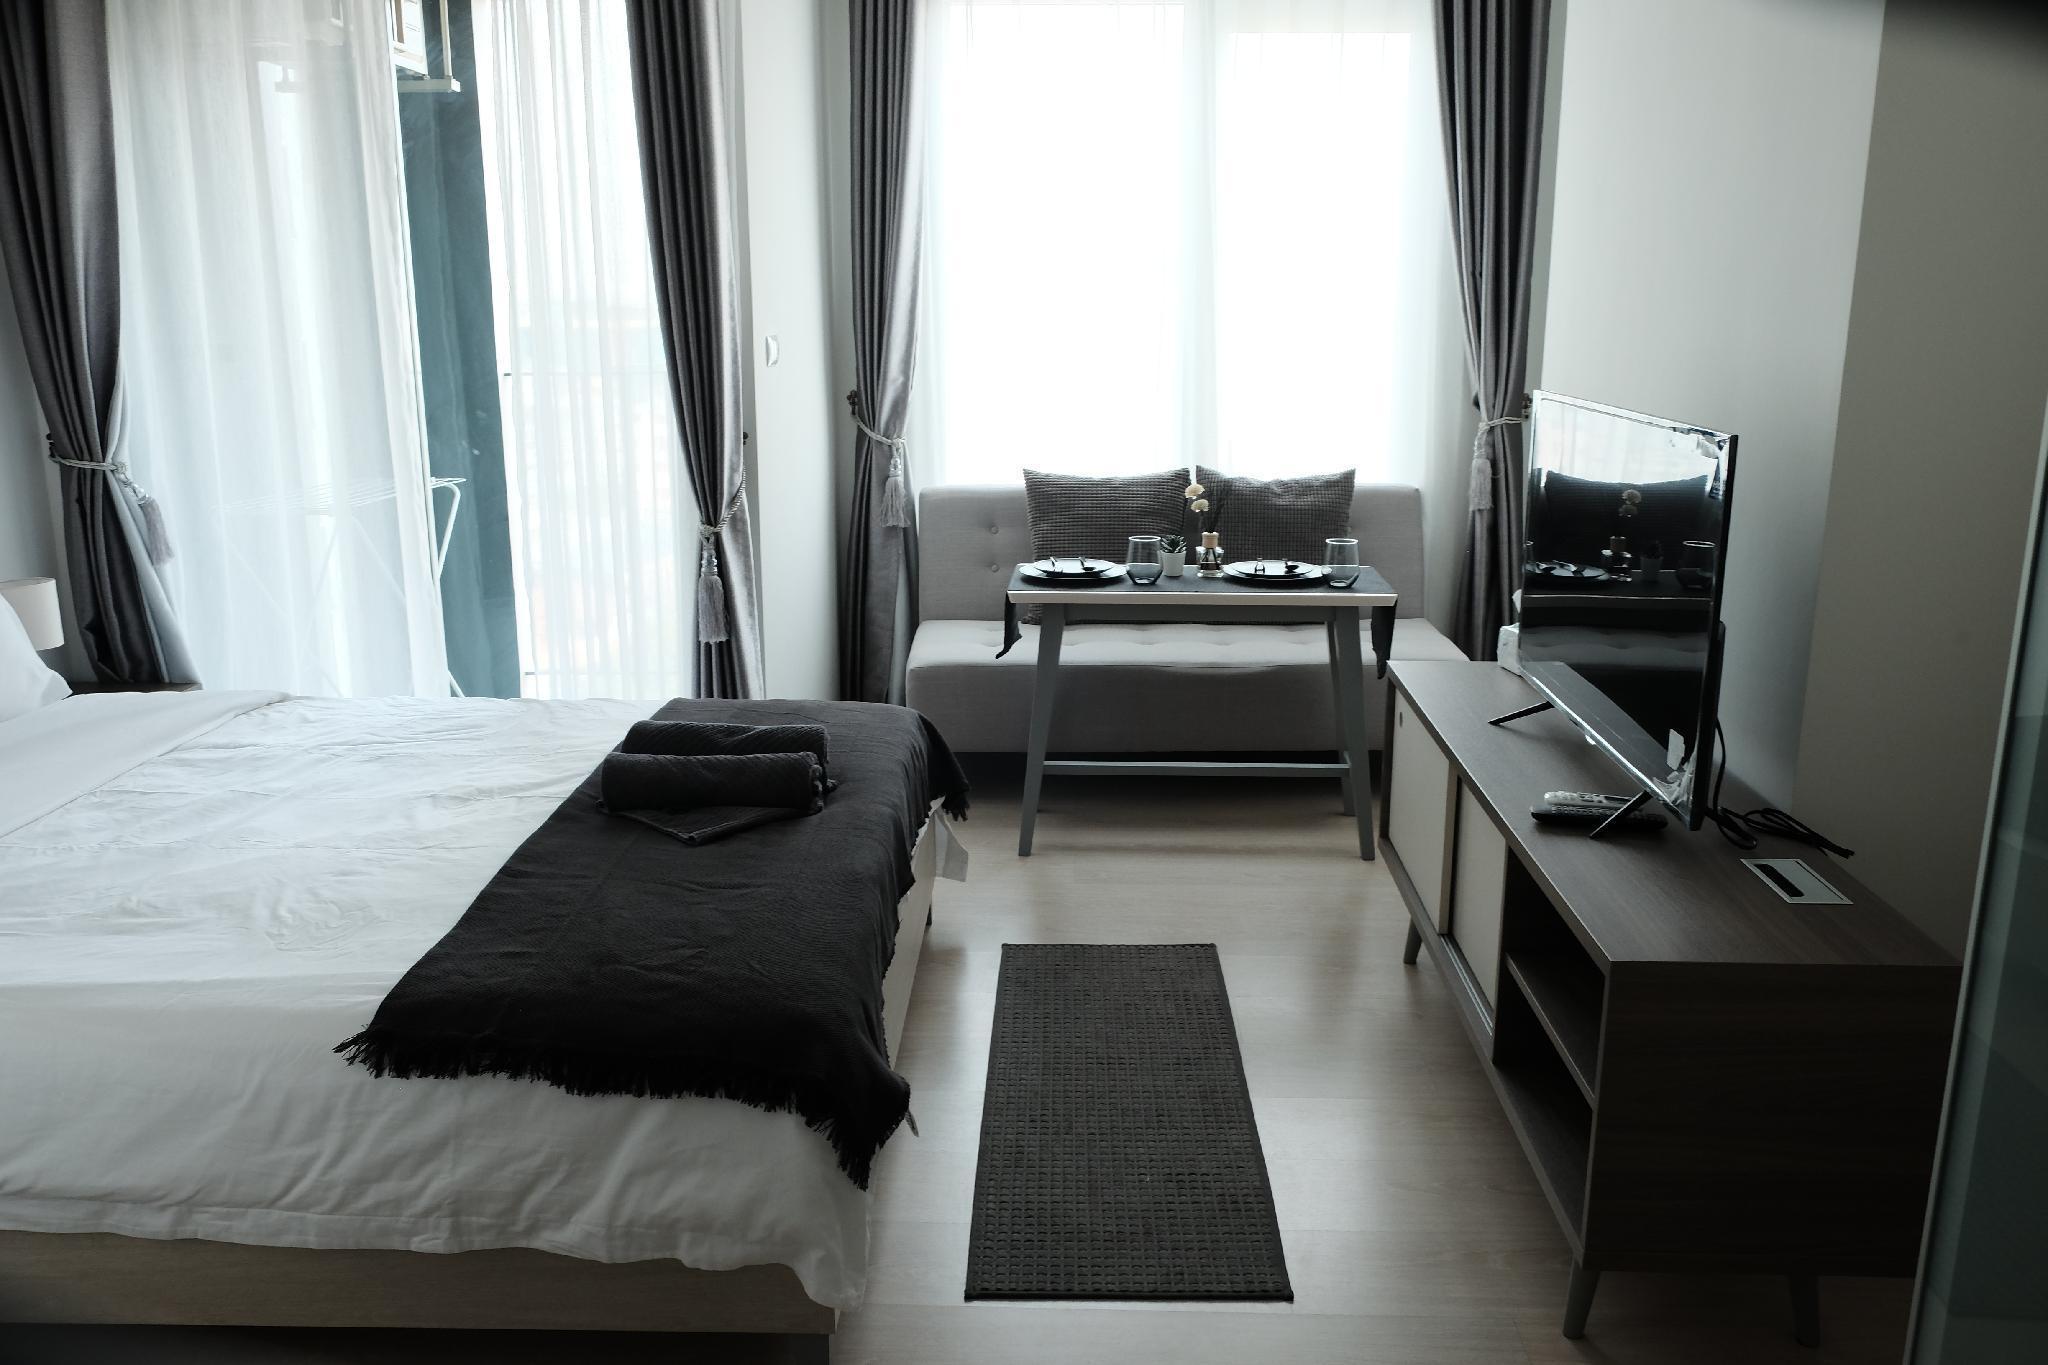 New Room/Ratchada/Infinity Pool/Shopping Street อพาร์ตเมนต์ 1 ห้องนอน 1 ห้องน้ำส่วนตัว ขนาด 26 ตร.ม. – รัชดาภิเษก